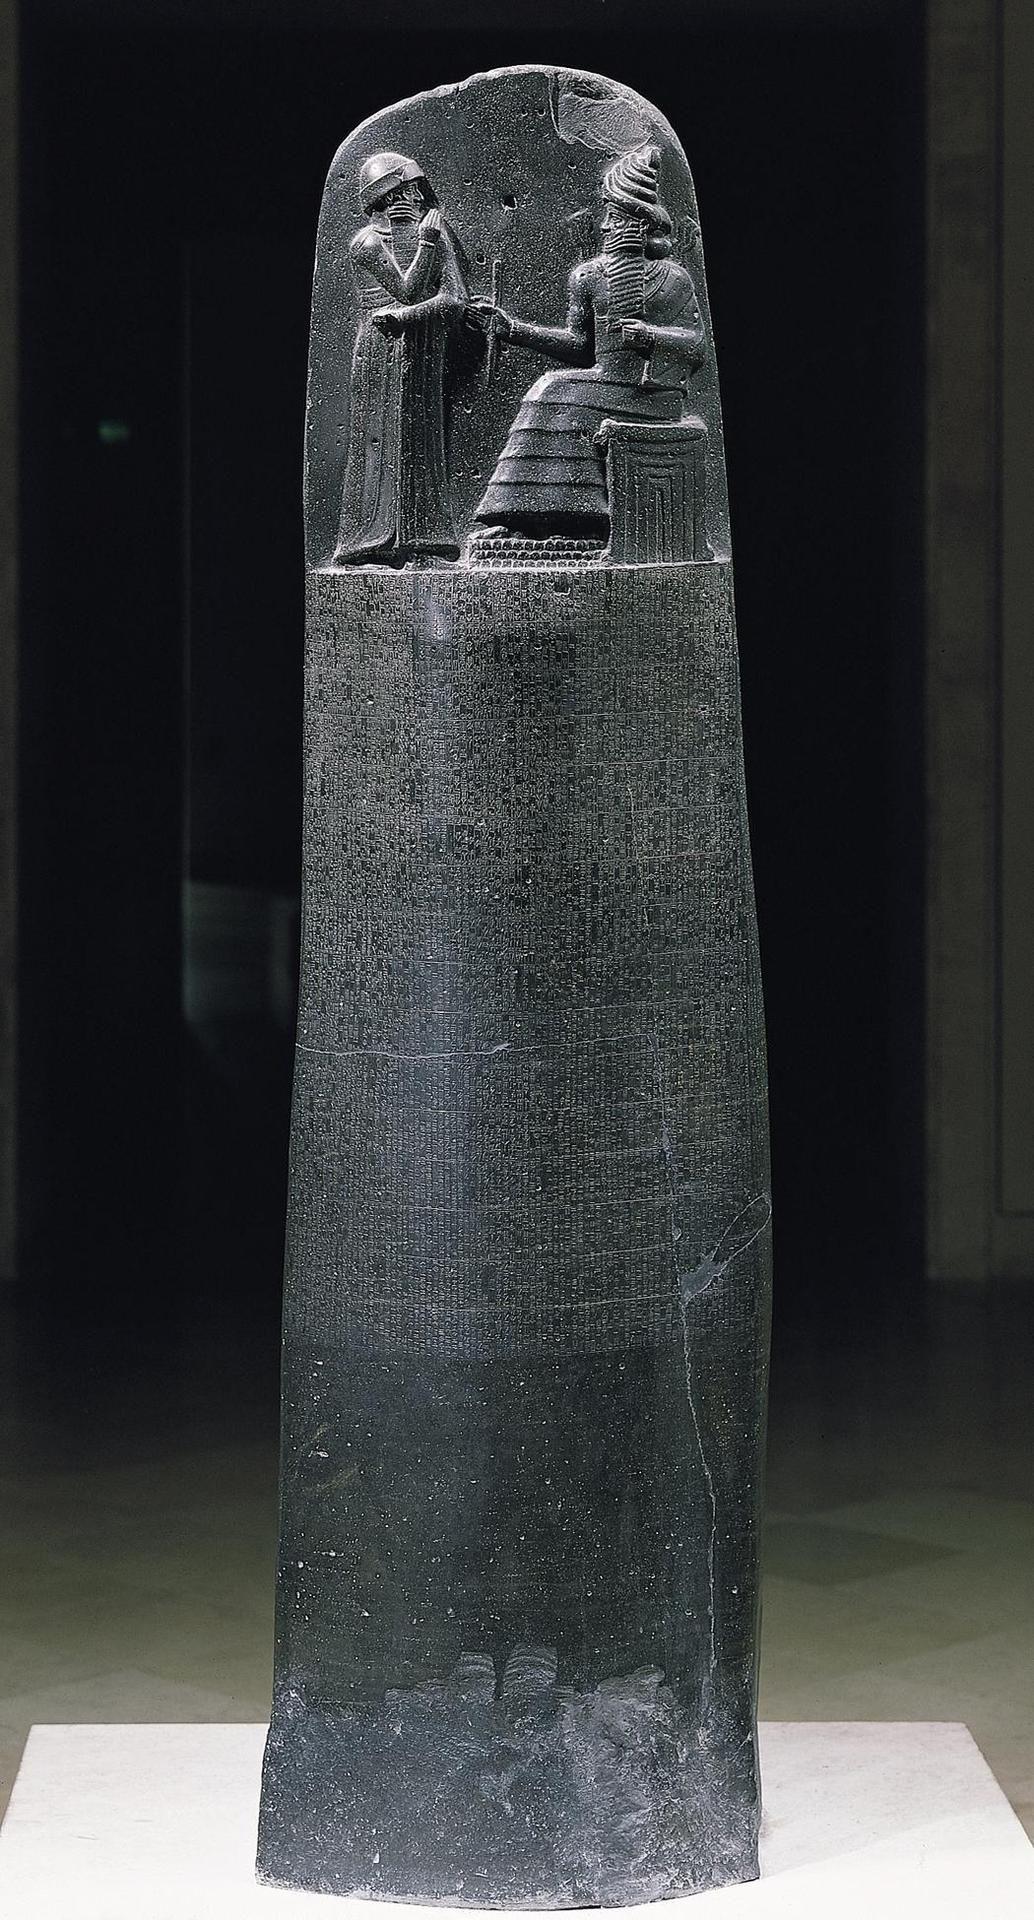 Law Code Of Hammurabi Basalt Babylon 1792 1750 Bce Carved In Babylonian Depicts Hammurabi With Ring And Staff Mesopotamia Ancient Mesopotamia Ancient Art